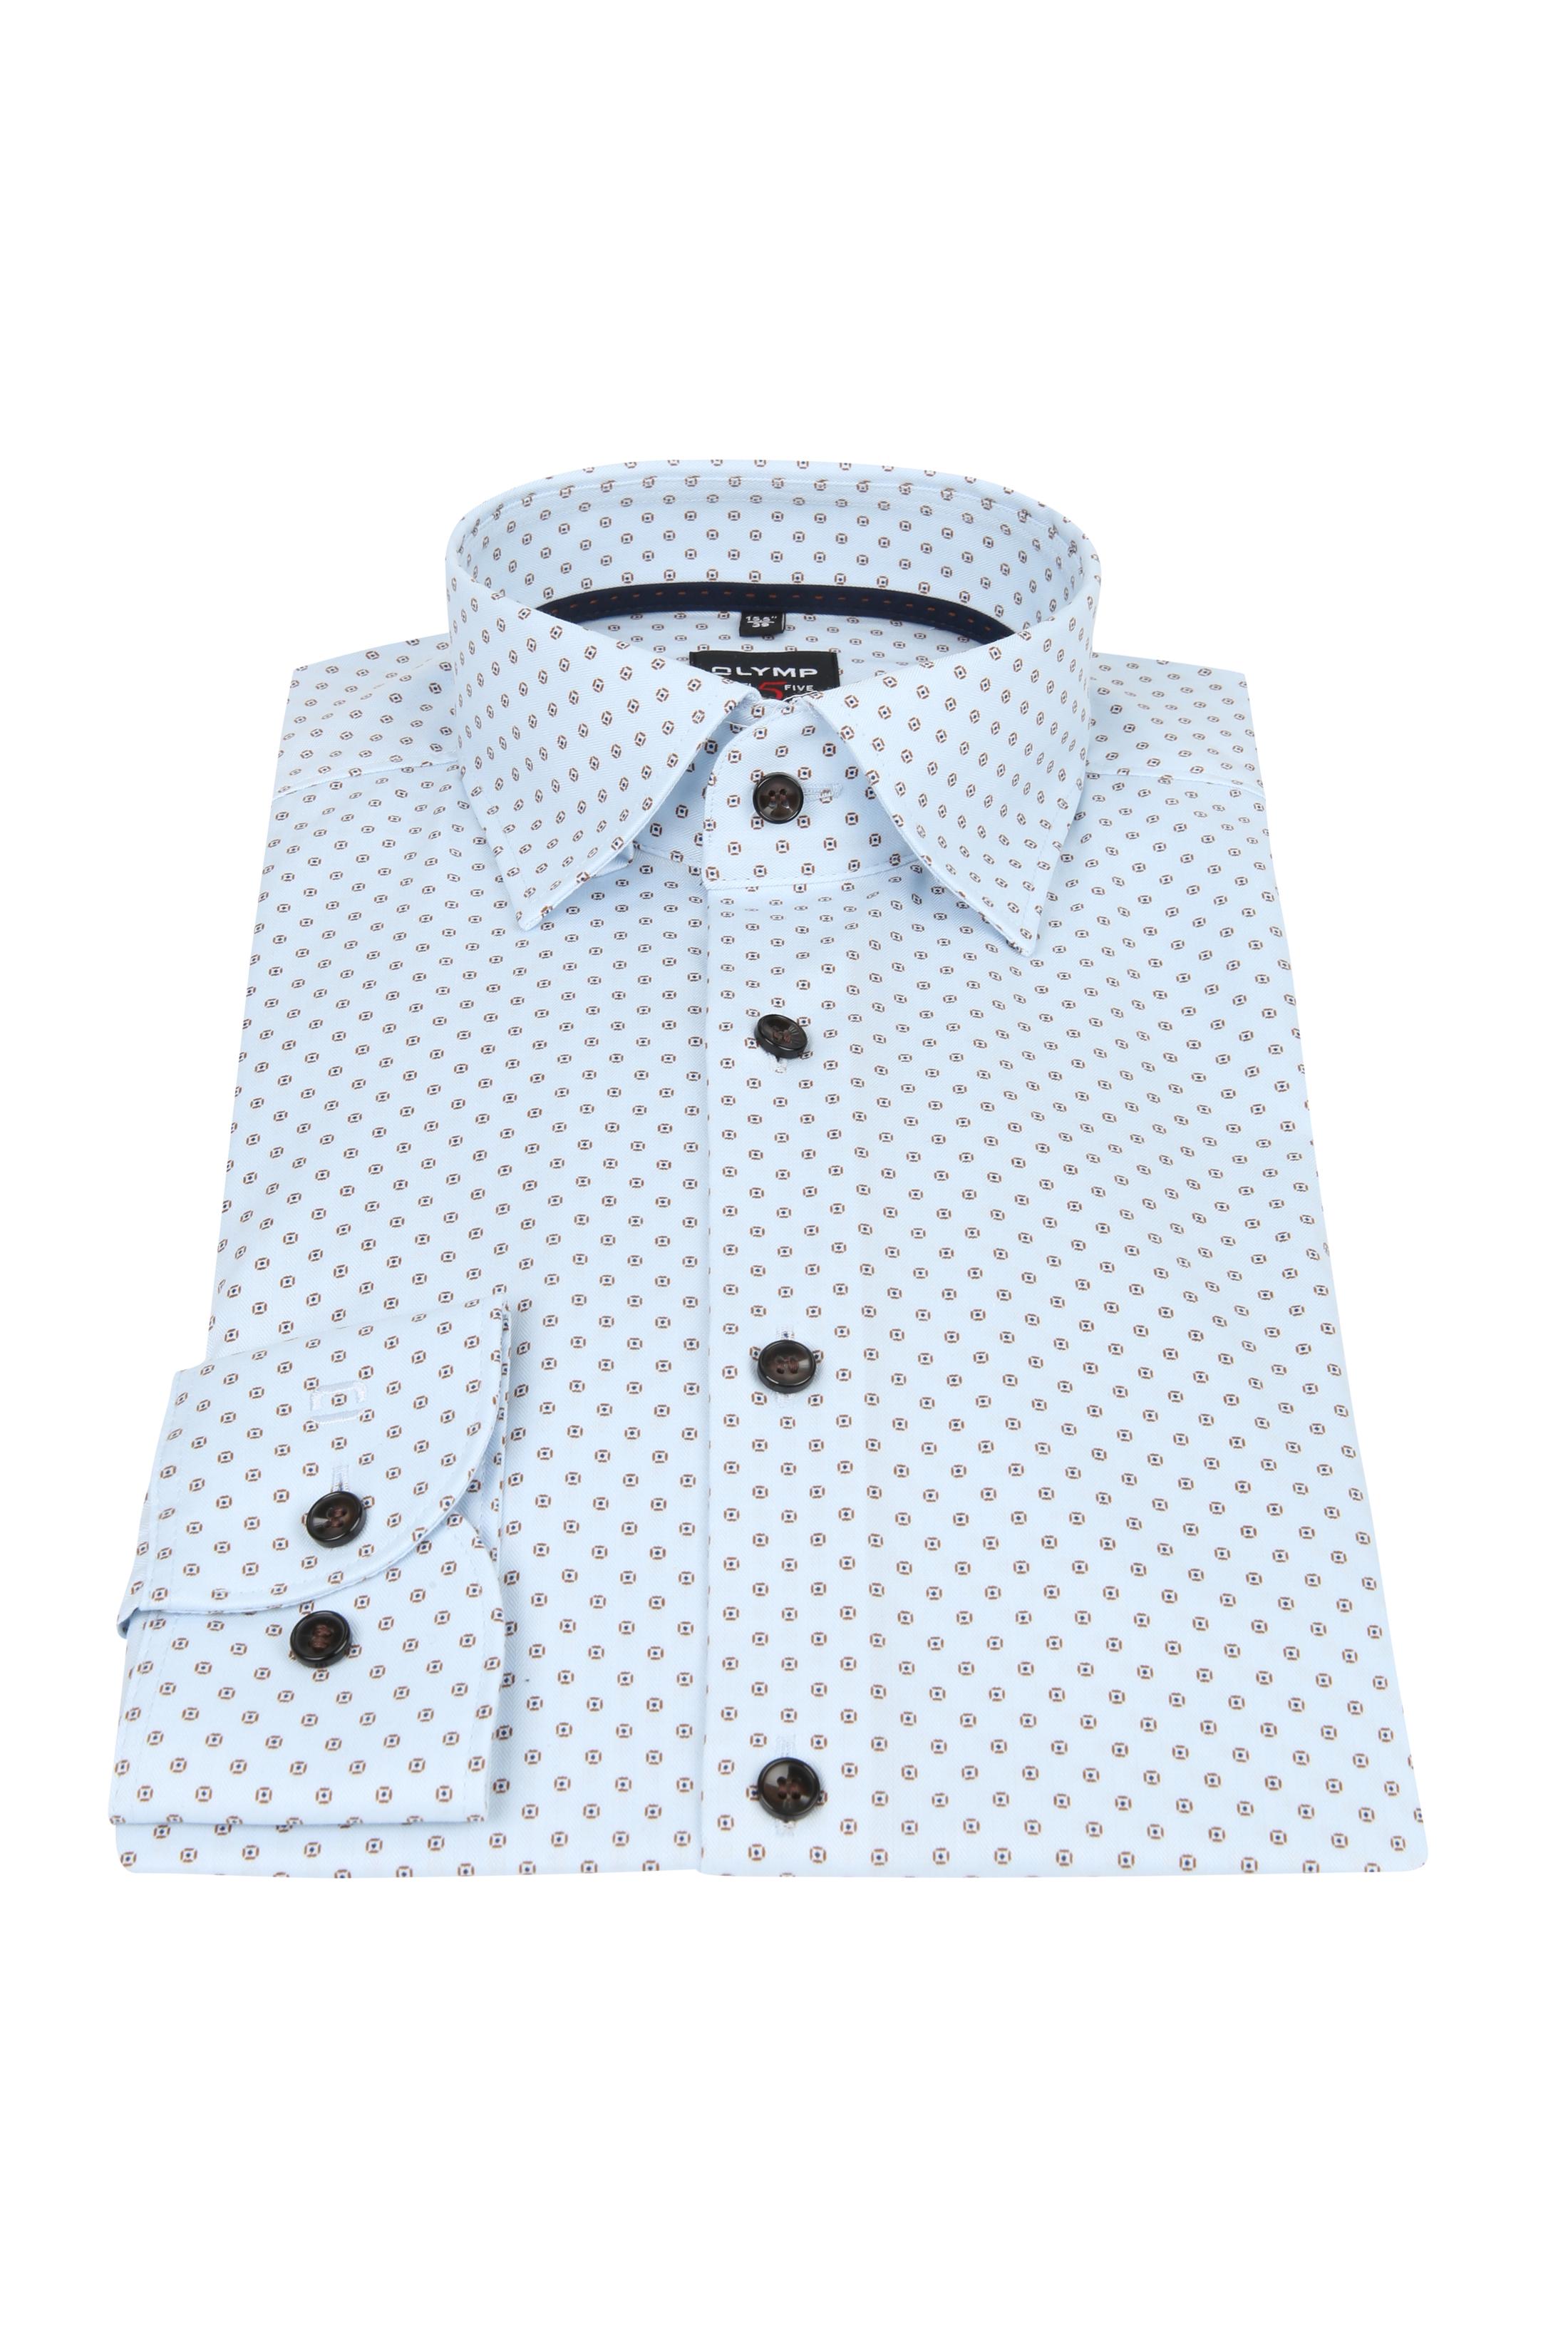 OLYMP Overhemd Lvl 5 Dessin Blauw